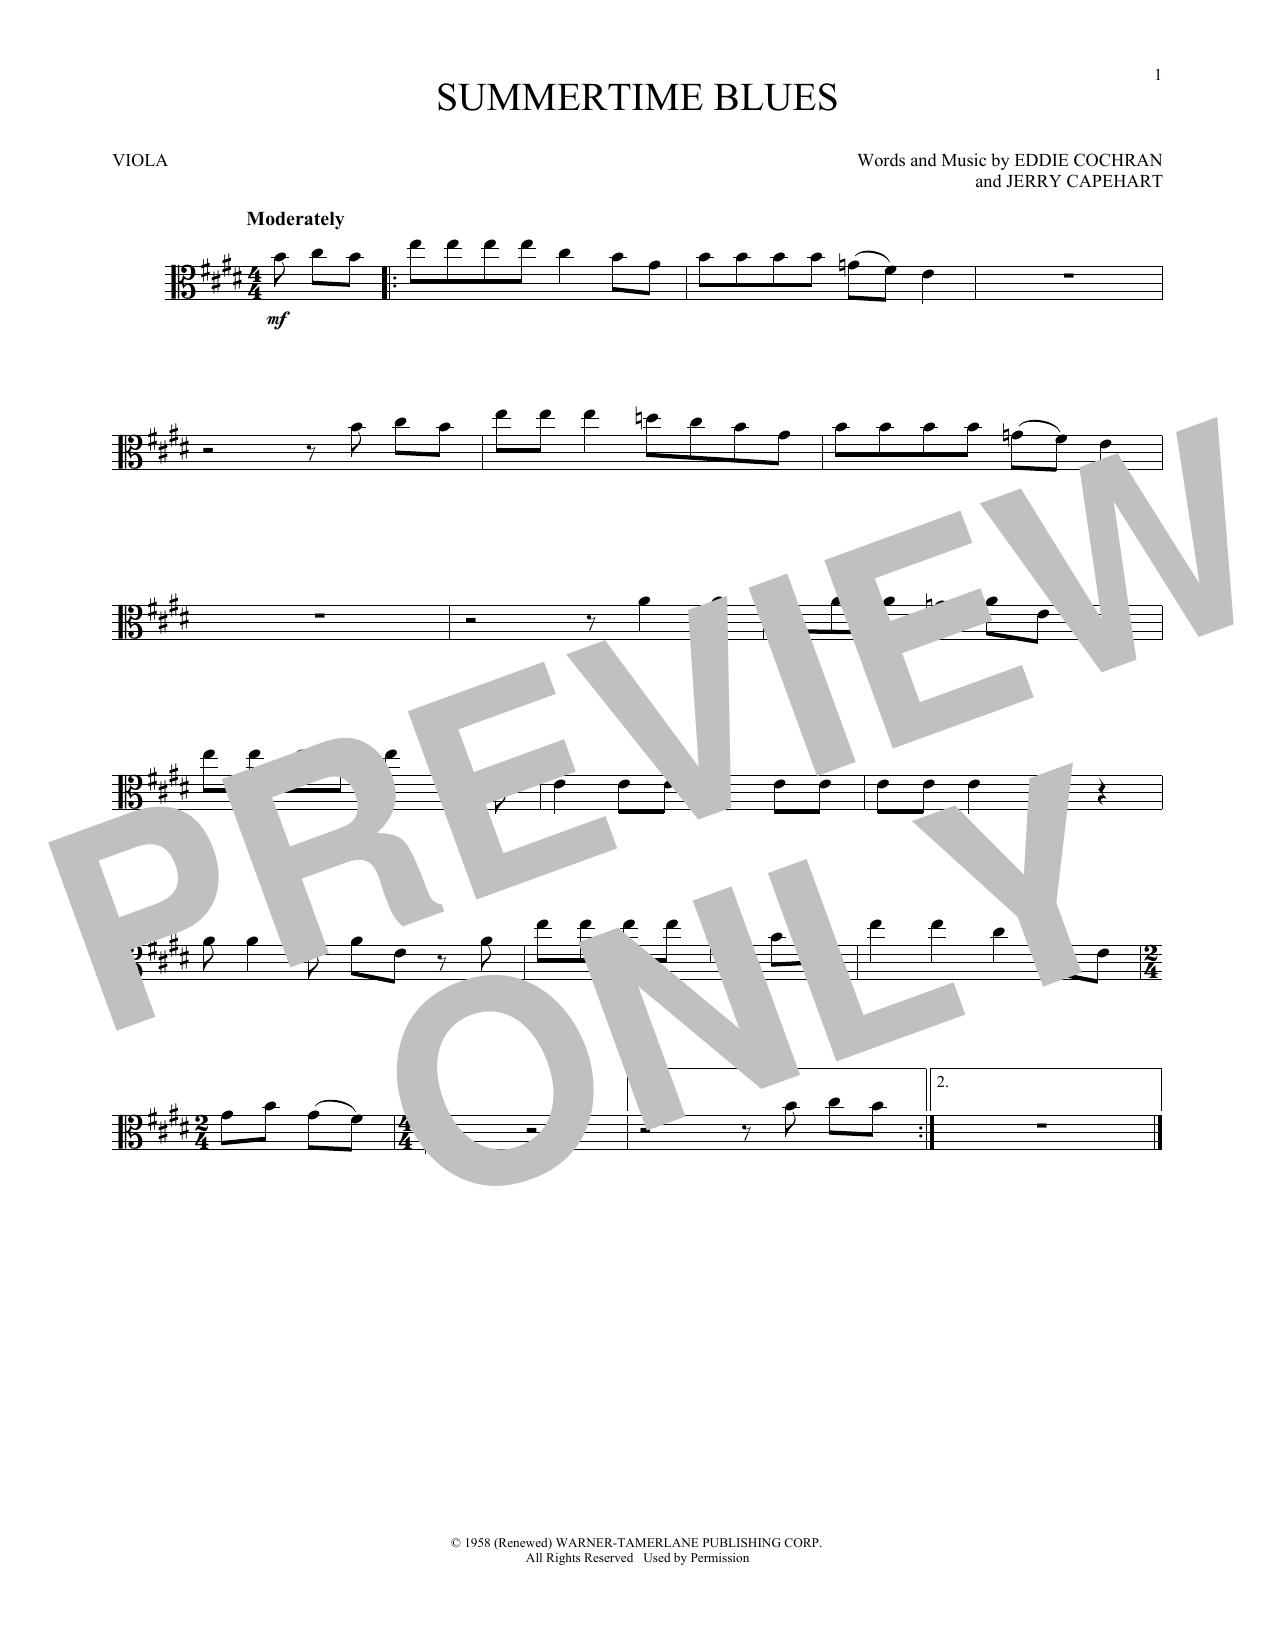 Summertime Blues (Viola Solo)